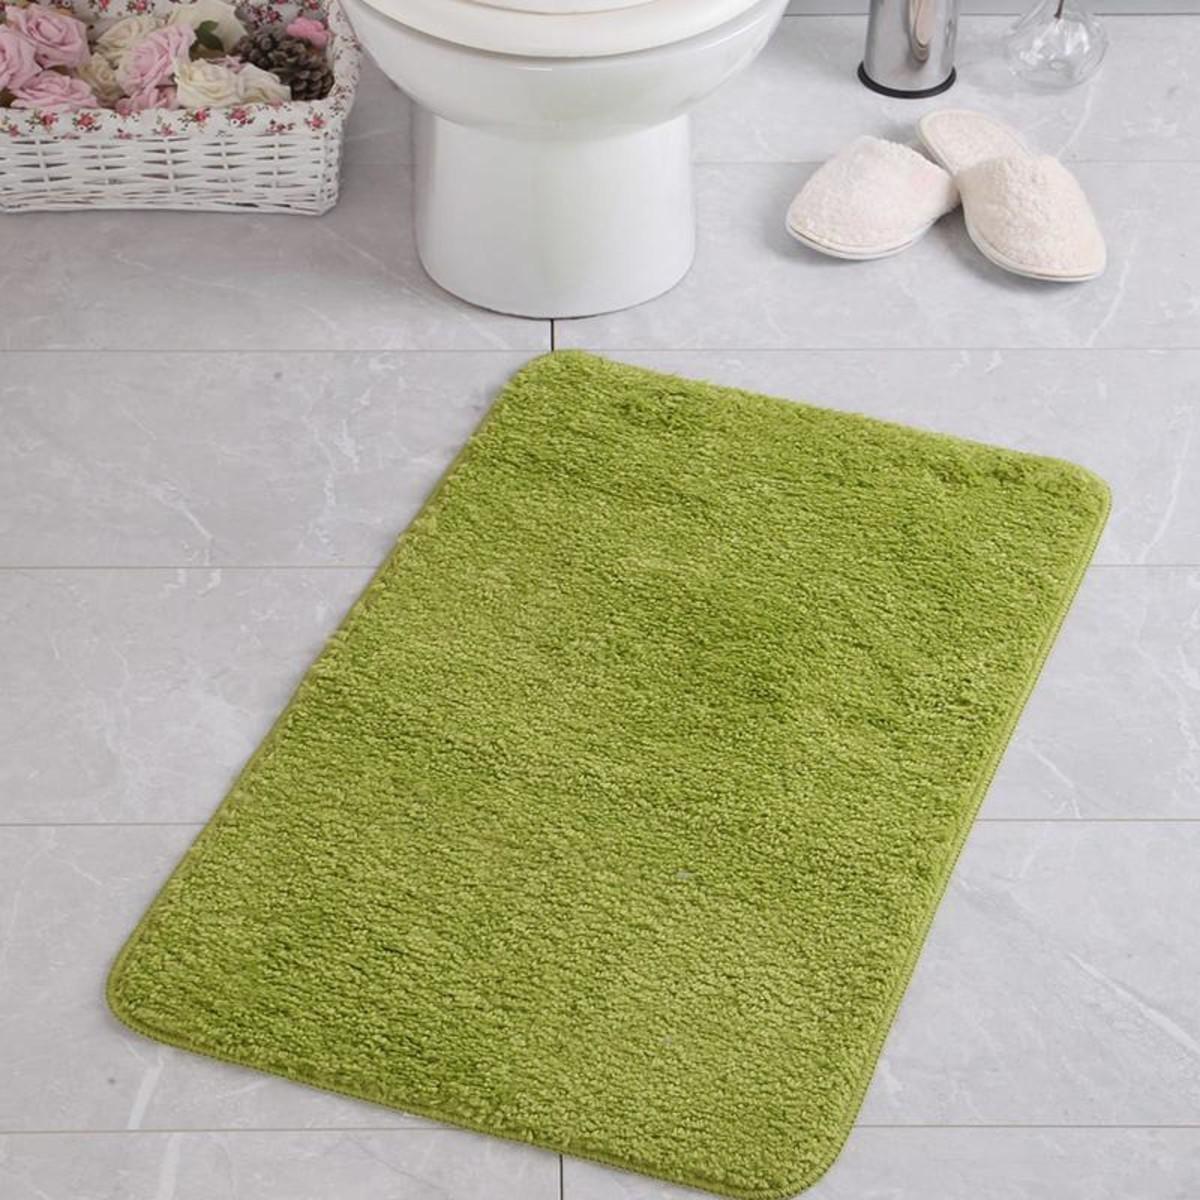 Коврик для ванной Aqua-Prime Be&#39Maks 60Х100см 588 18мм (Ярко-Зеленый) 1/20